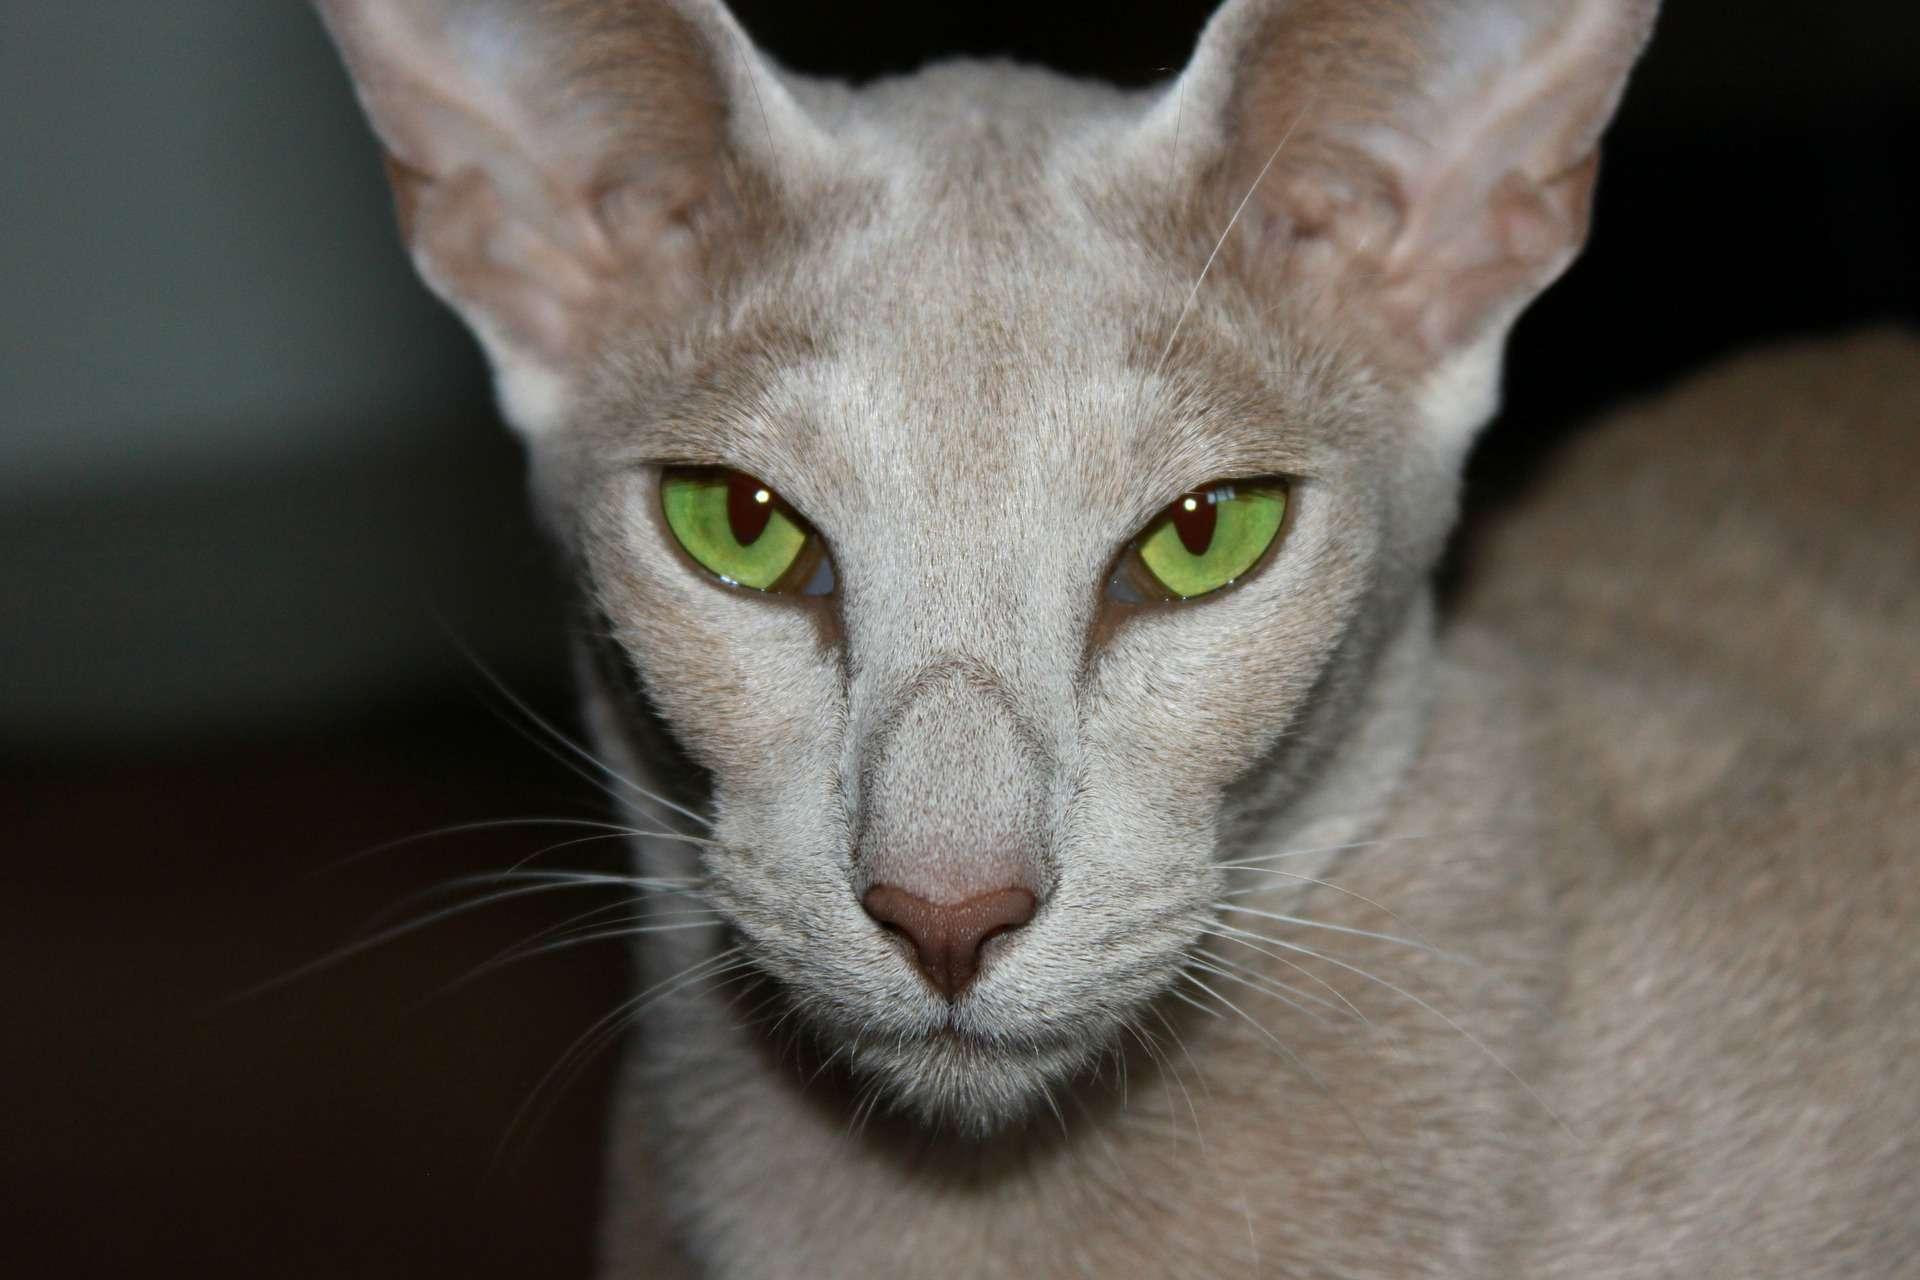 Oriental shorthair cat close-up